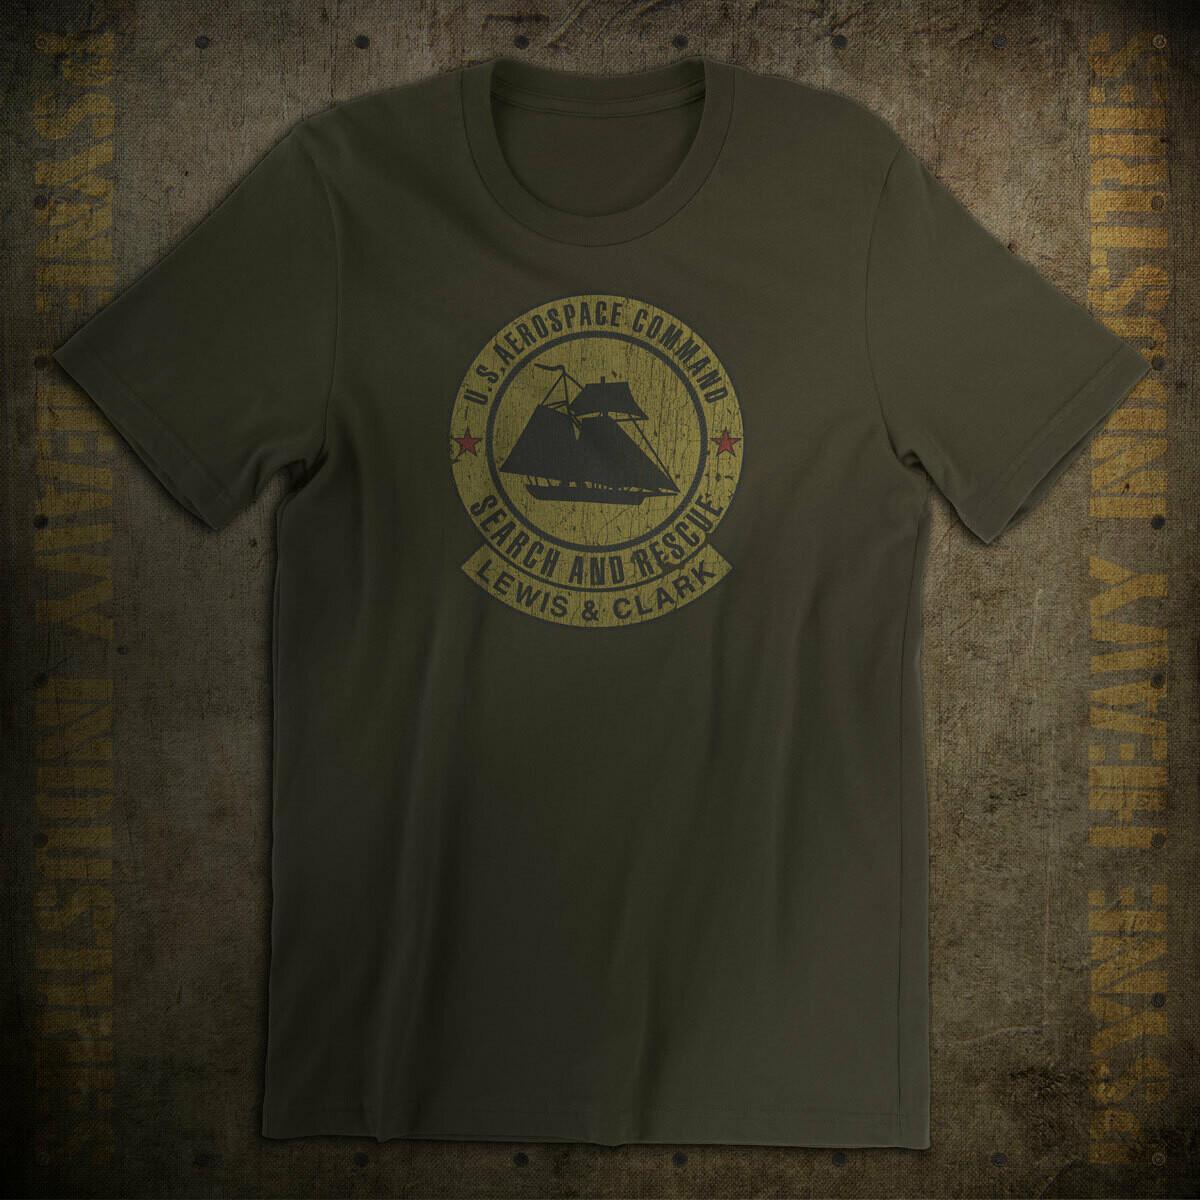 U.S.A.C. Lewis & Clark Crew Insignia Vintage T-Shirt